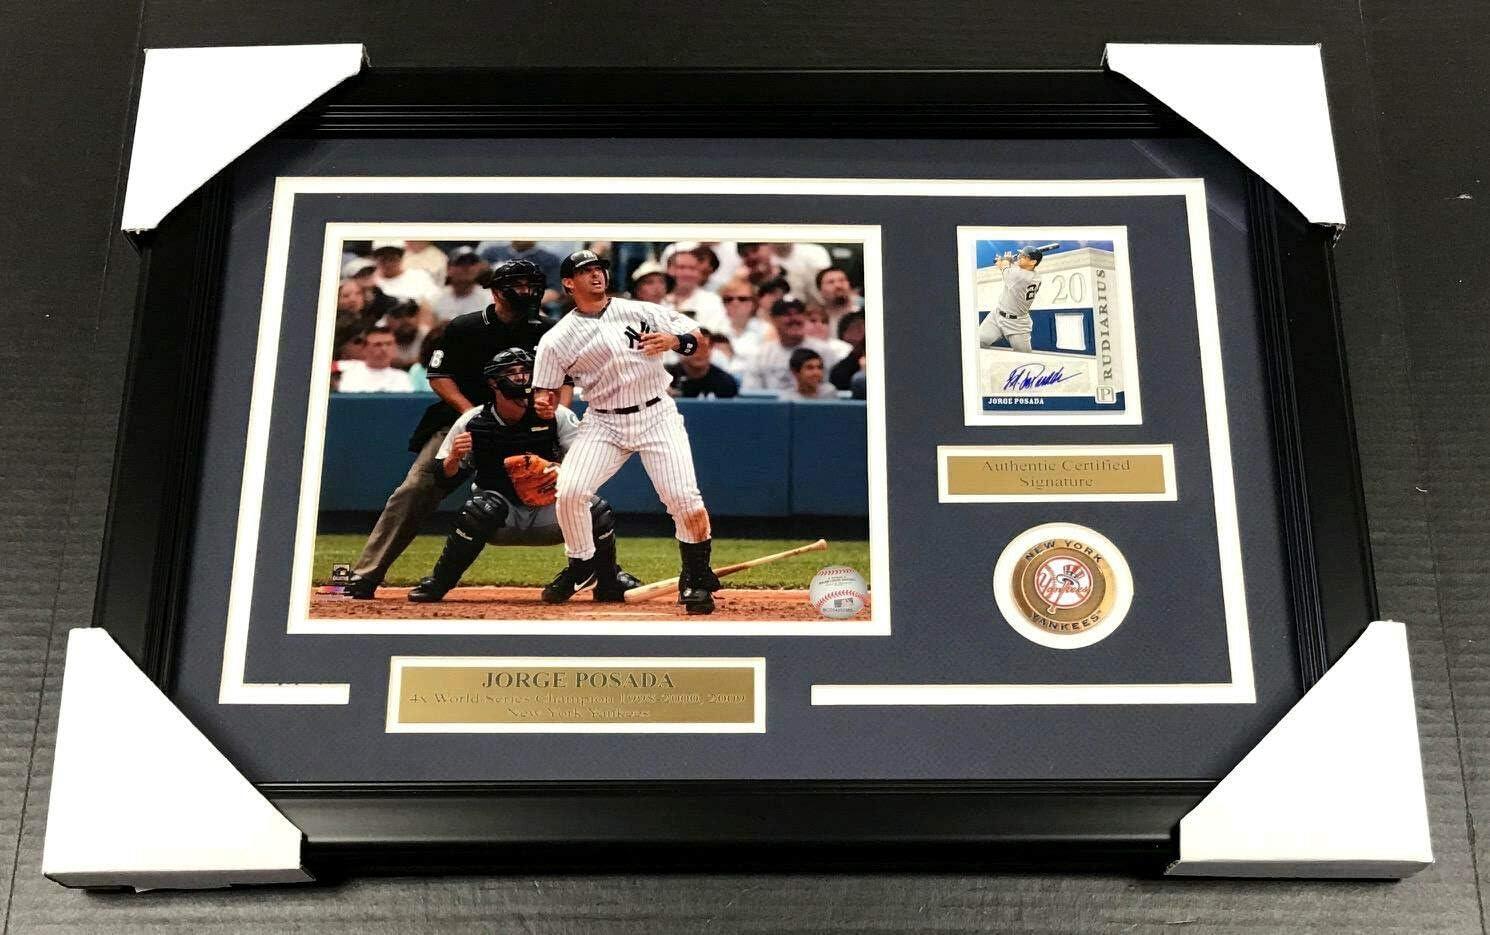 JORGE POSADA NEW YORK YANKEES SIGNED Autographed CARD W// 8x10 PHOTO FRAMED